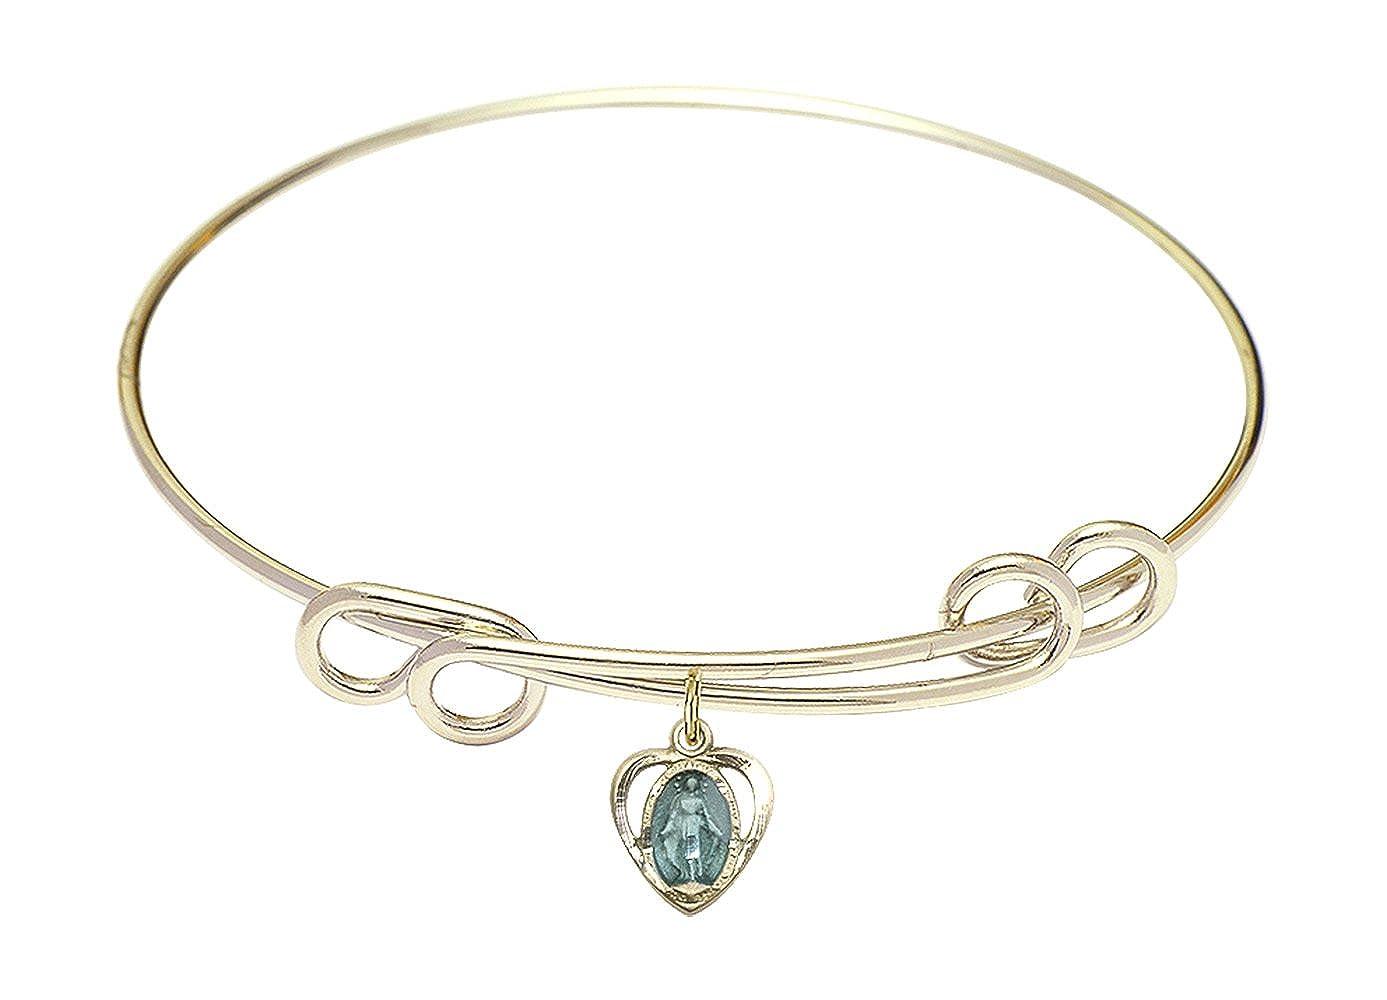 DiamondJewelryNY Double Loop Bangle Bracelet with a Miraculous Heart Charm.